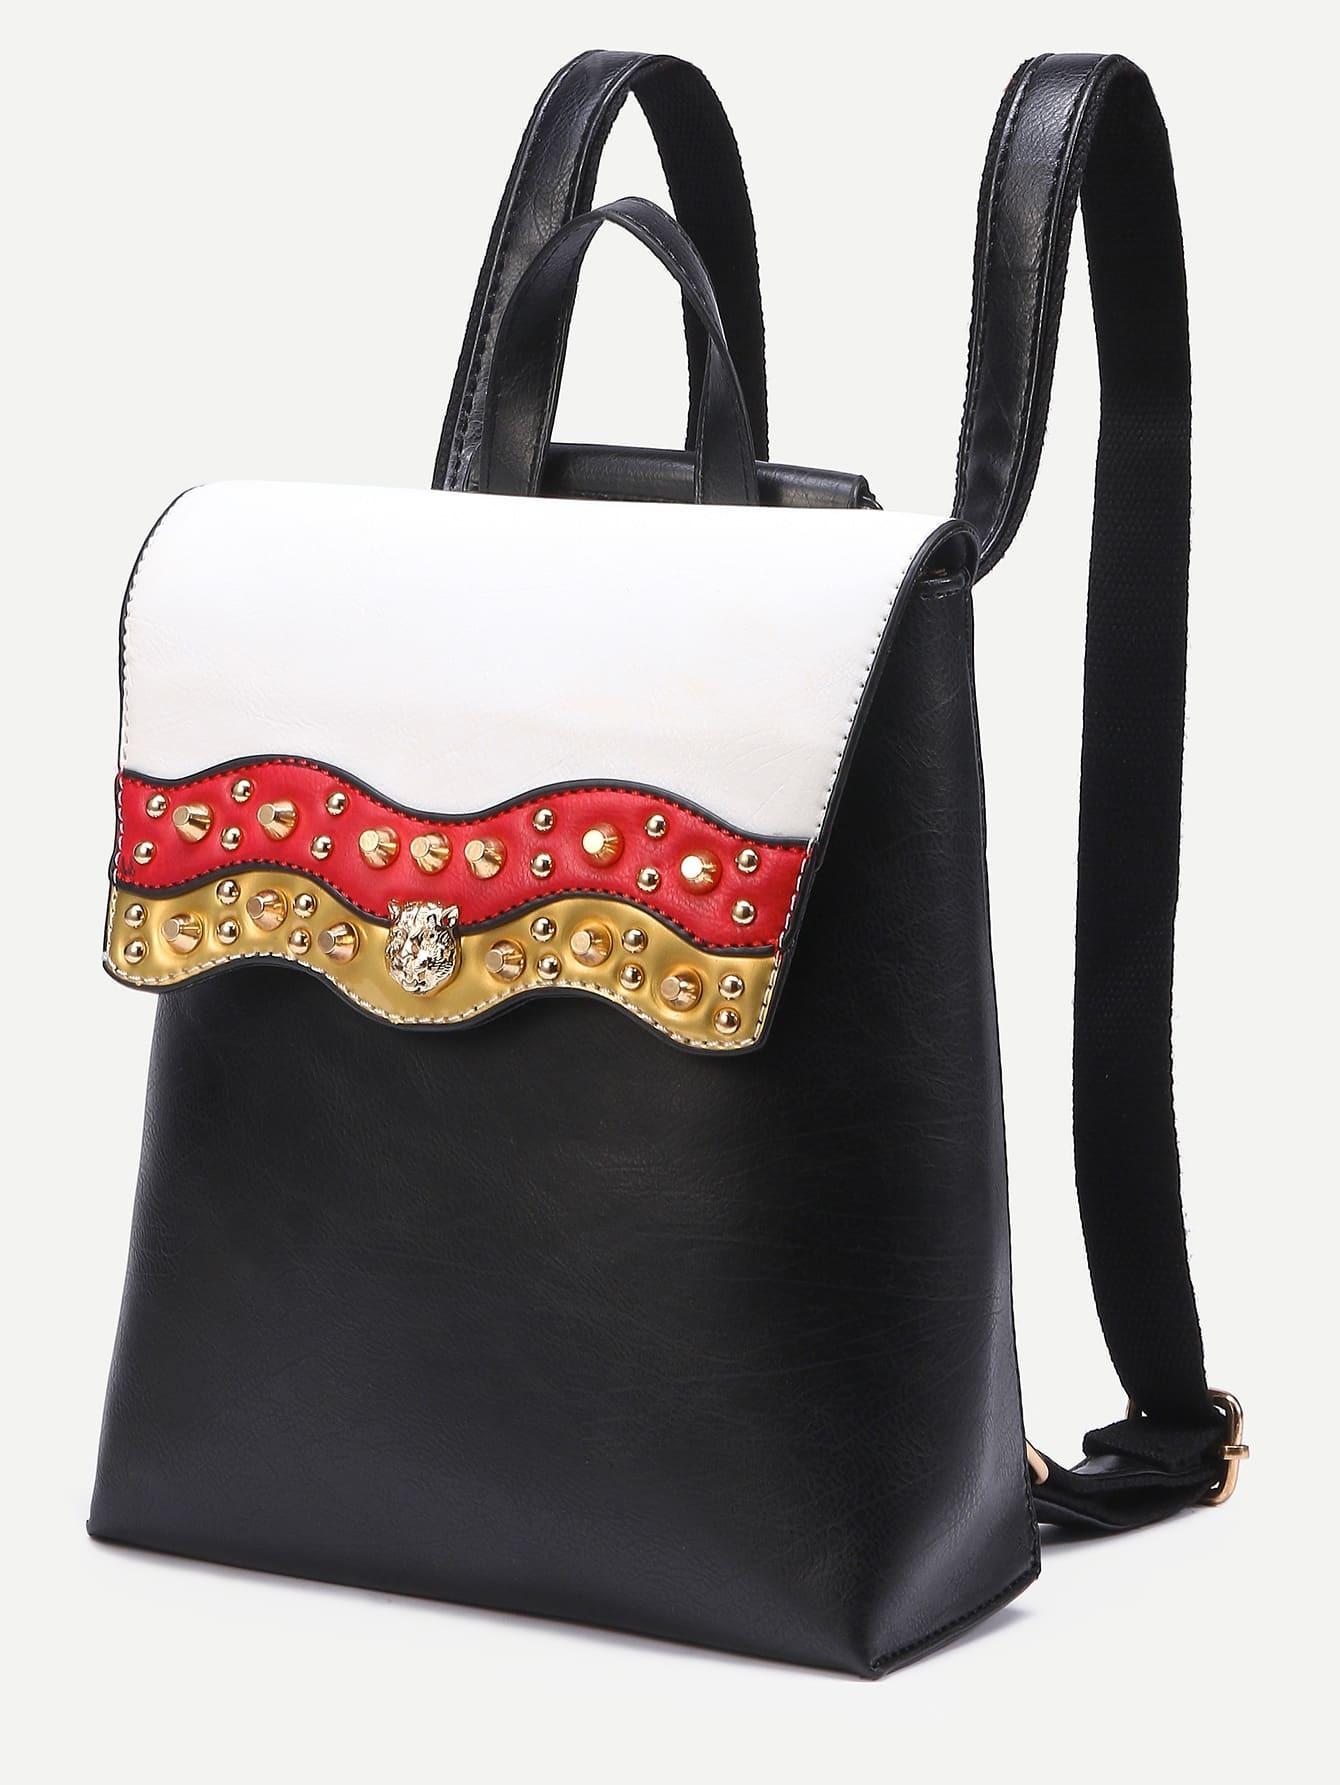 bag160808315_2